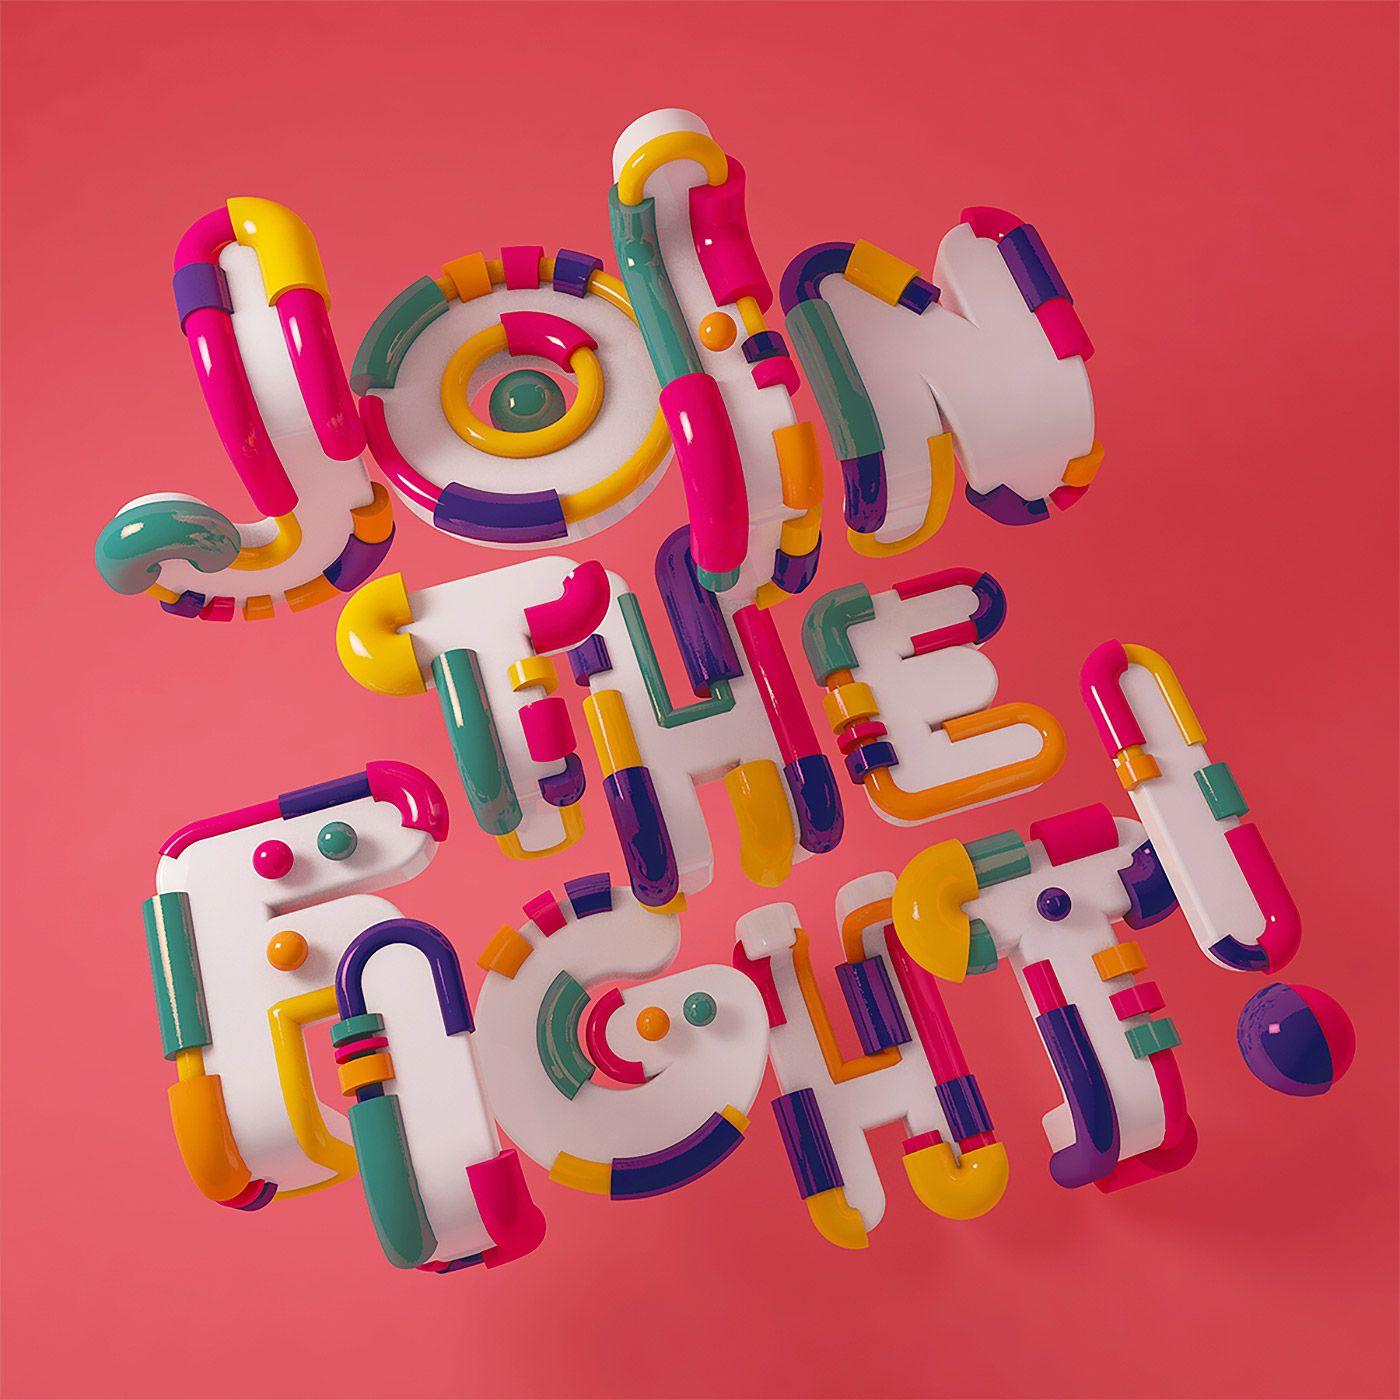 ede9d448f2d New Typographic Artworks by Carlo Cadenas – Inspiration Grid